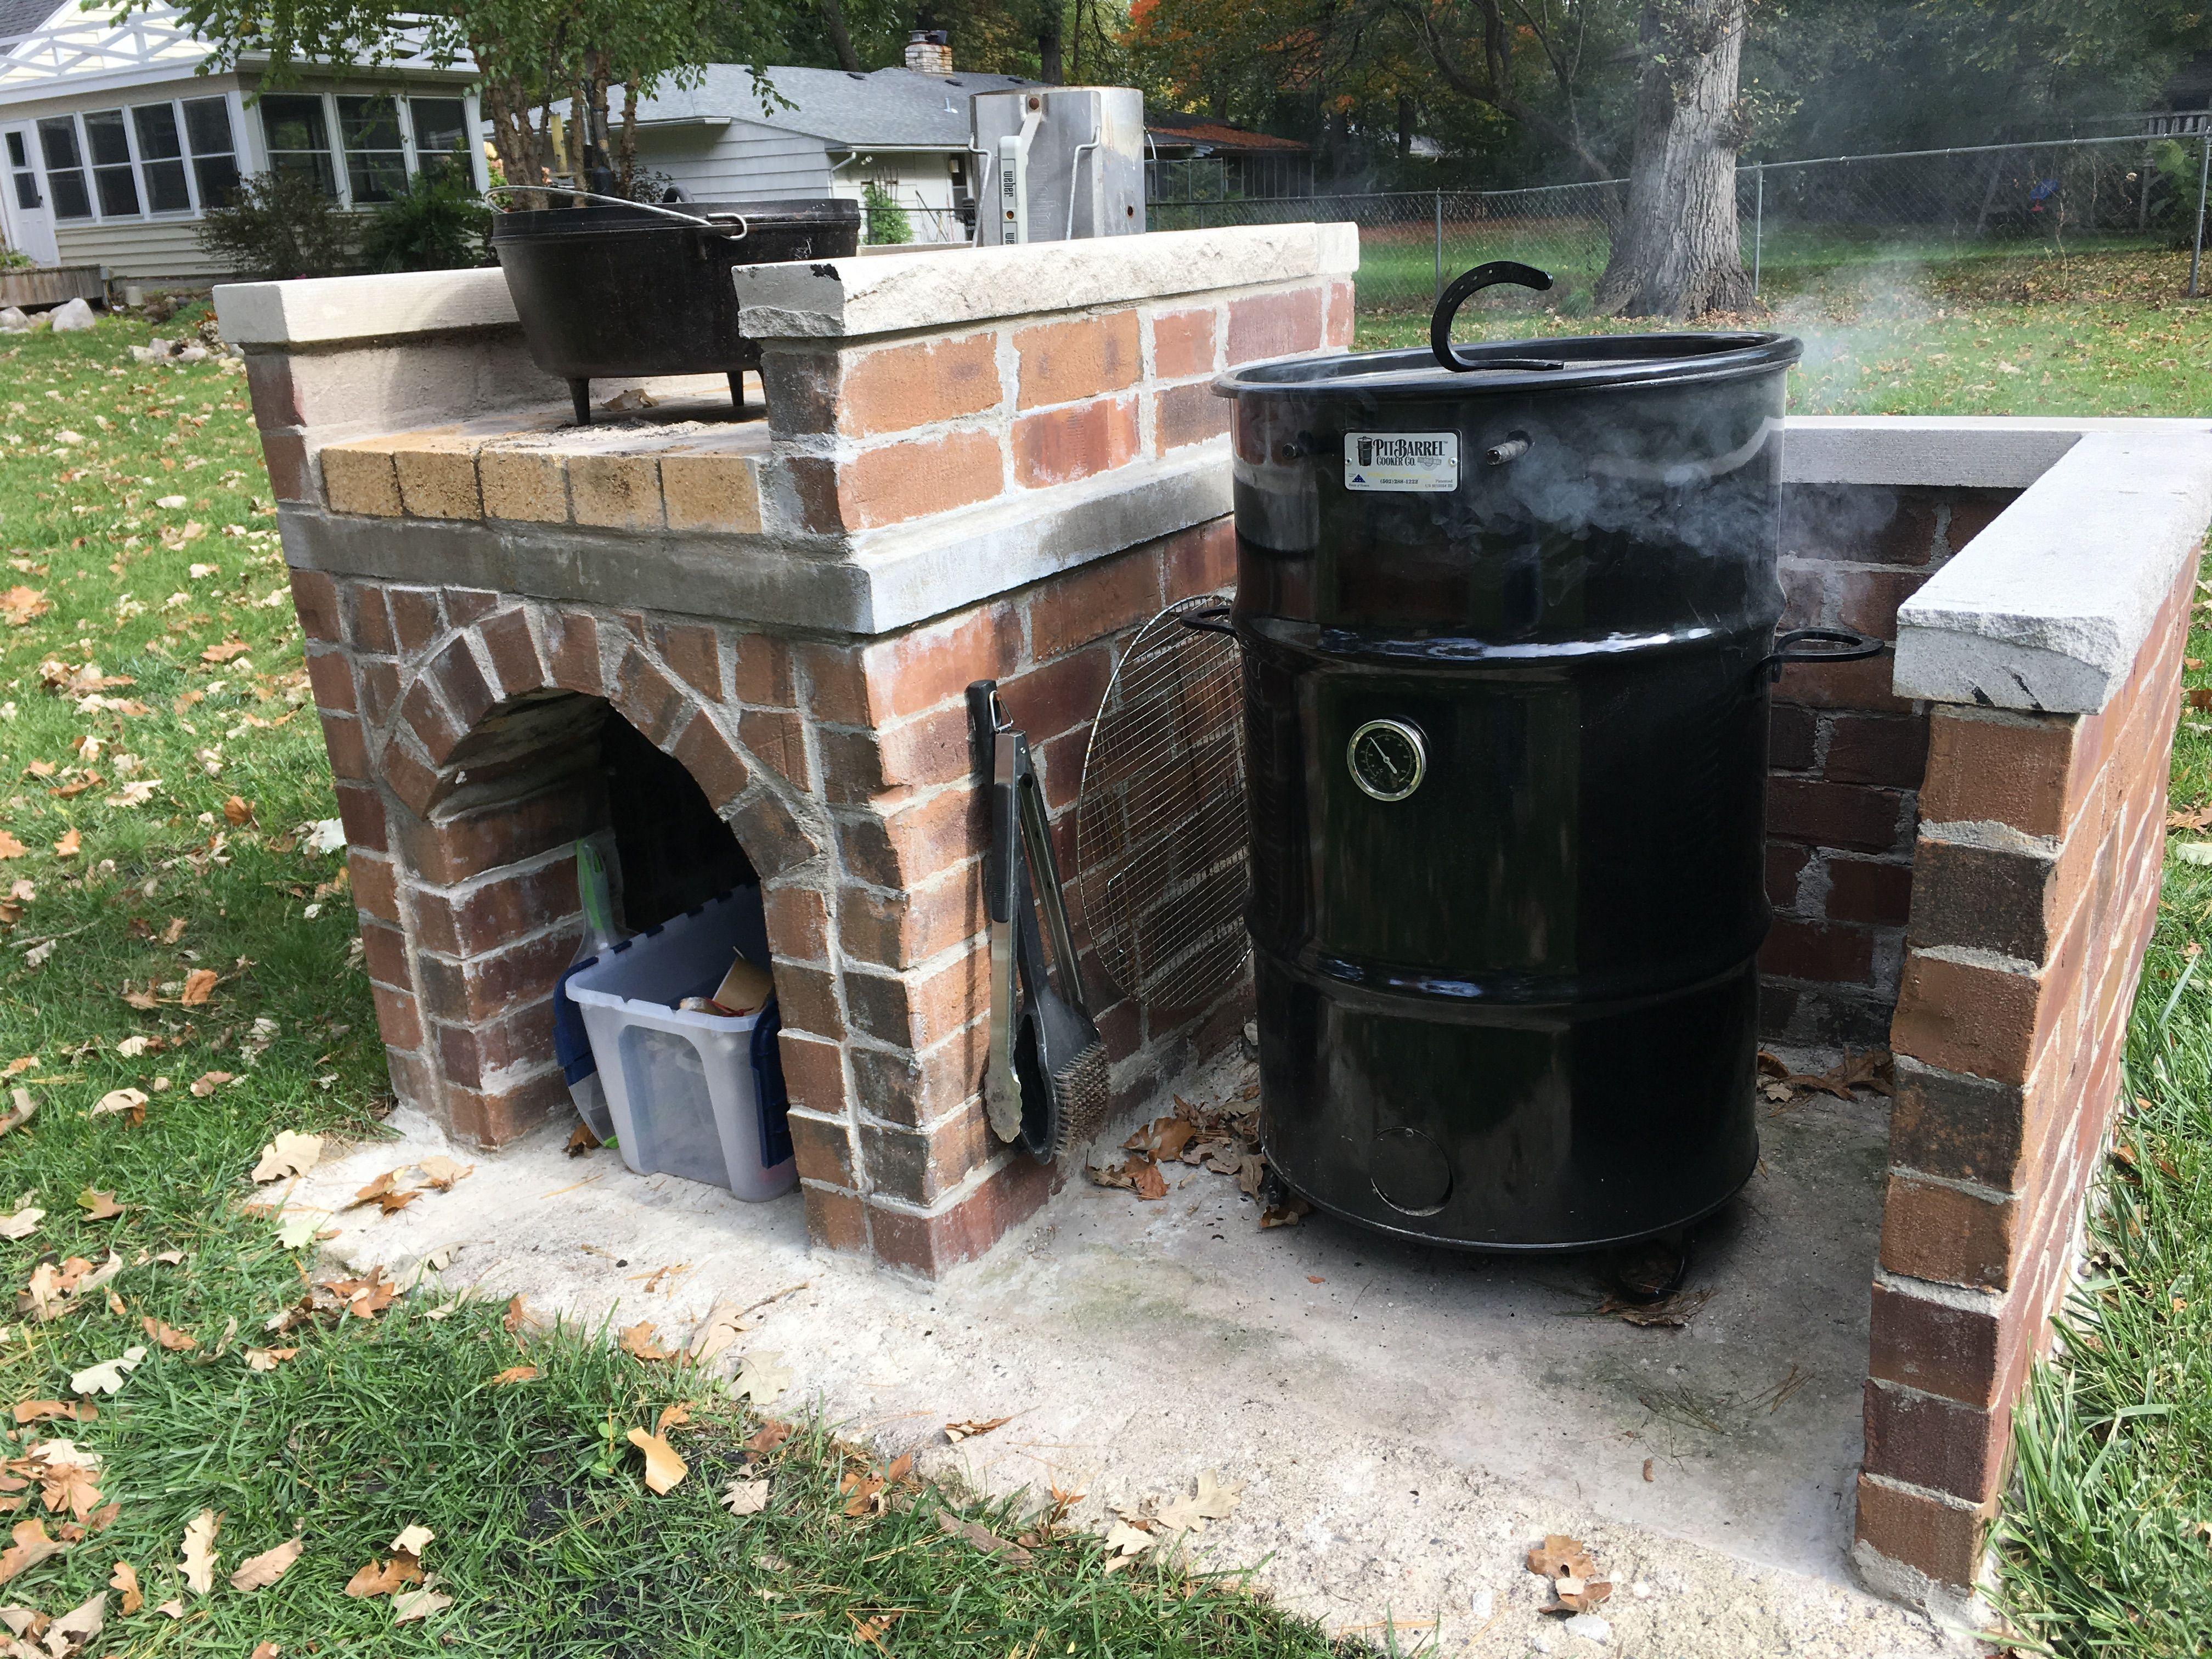 Diy Brick Pit Barrel Cooker Enclosure With Dutch Oven Table Dutch Oven Table Pit Barrel Cooker Pizza Oven Fireplace